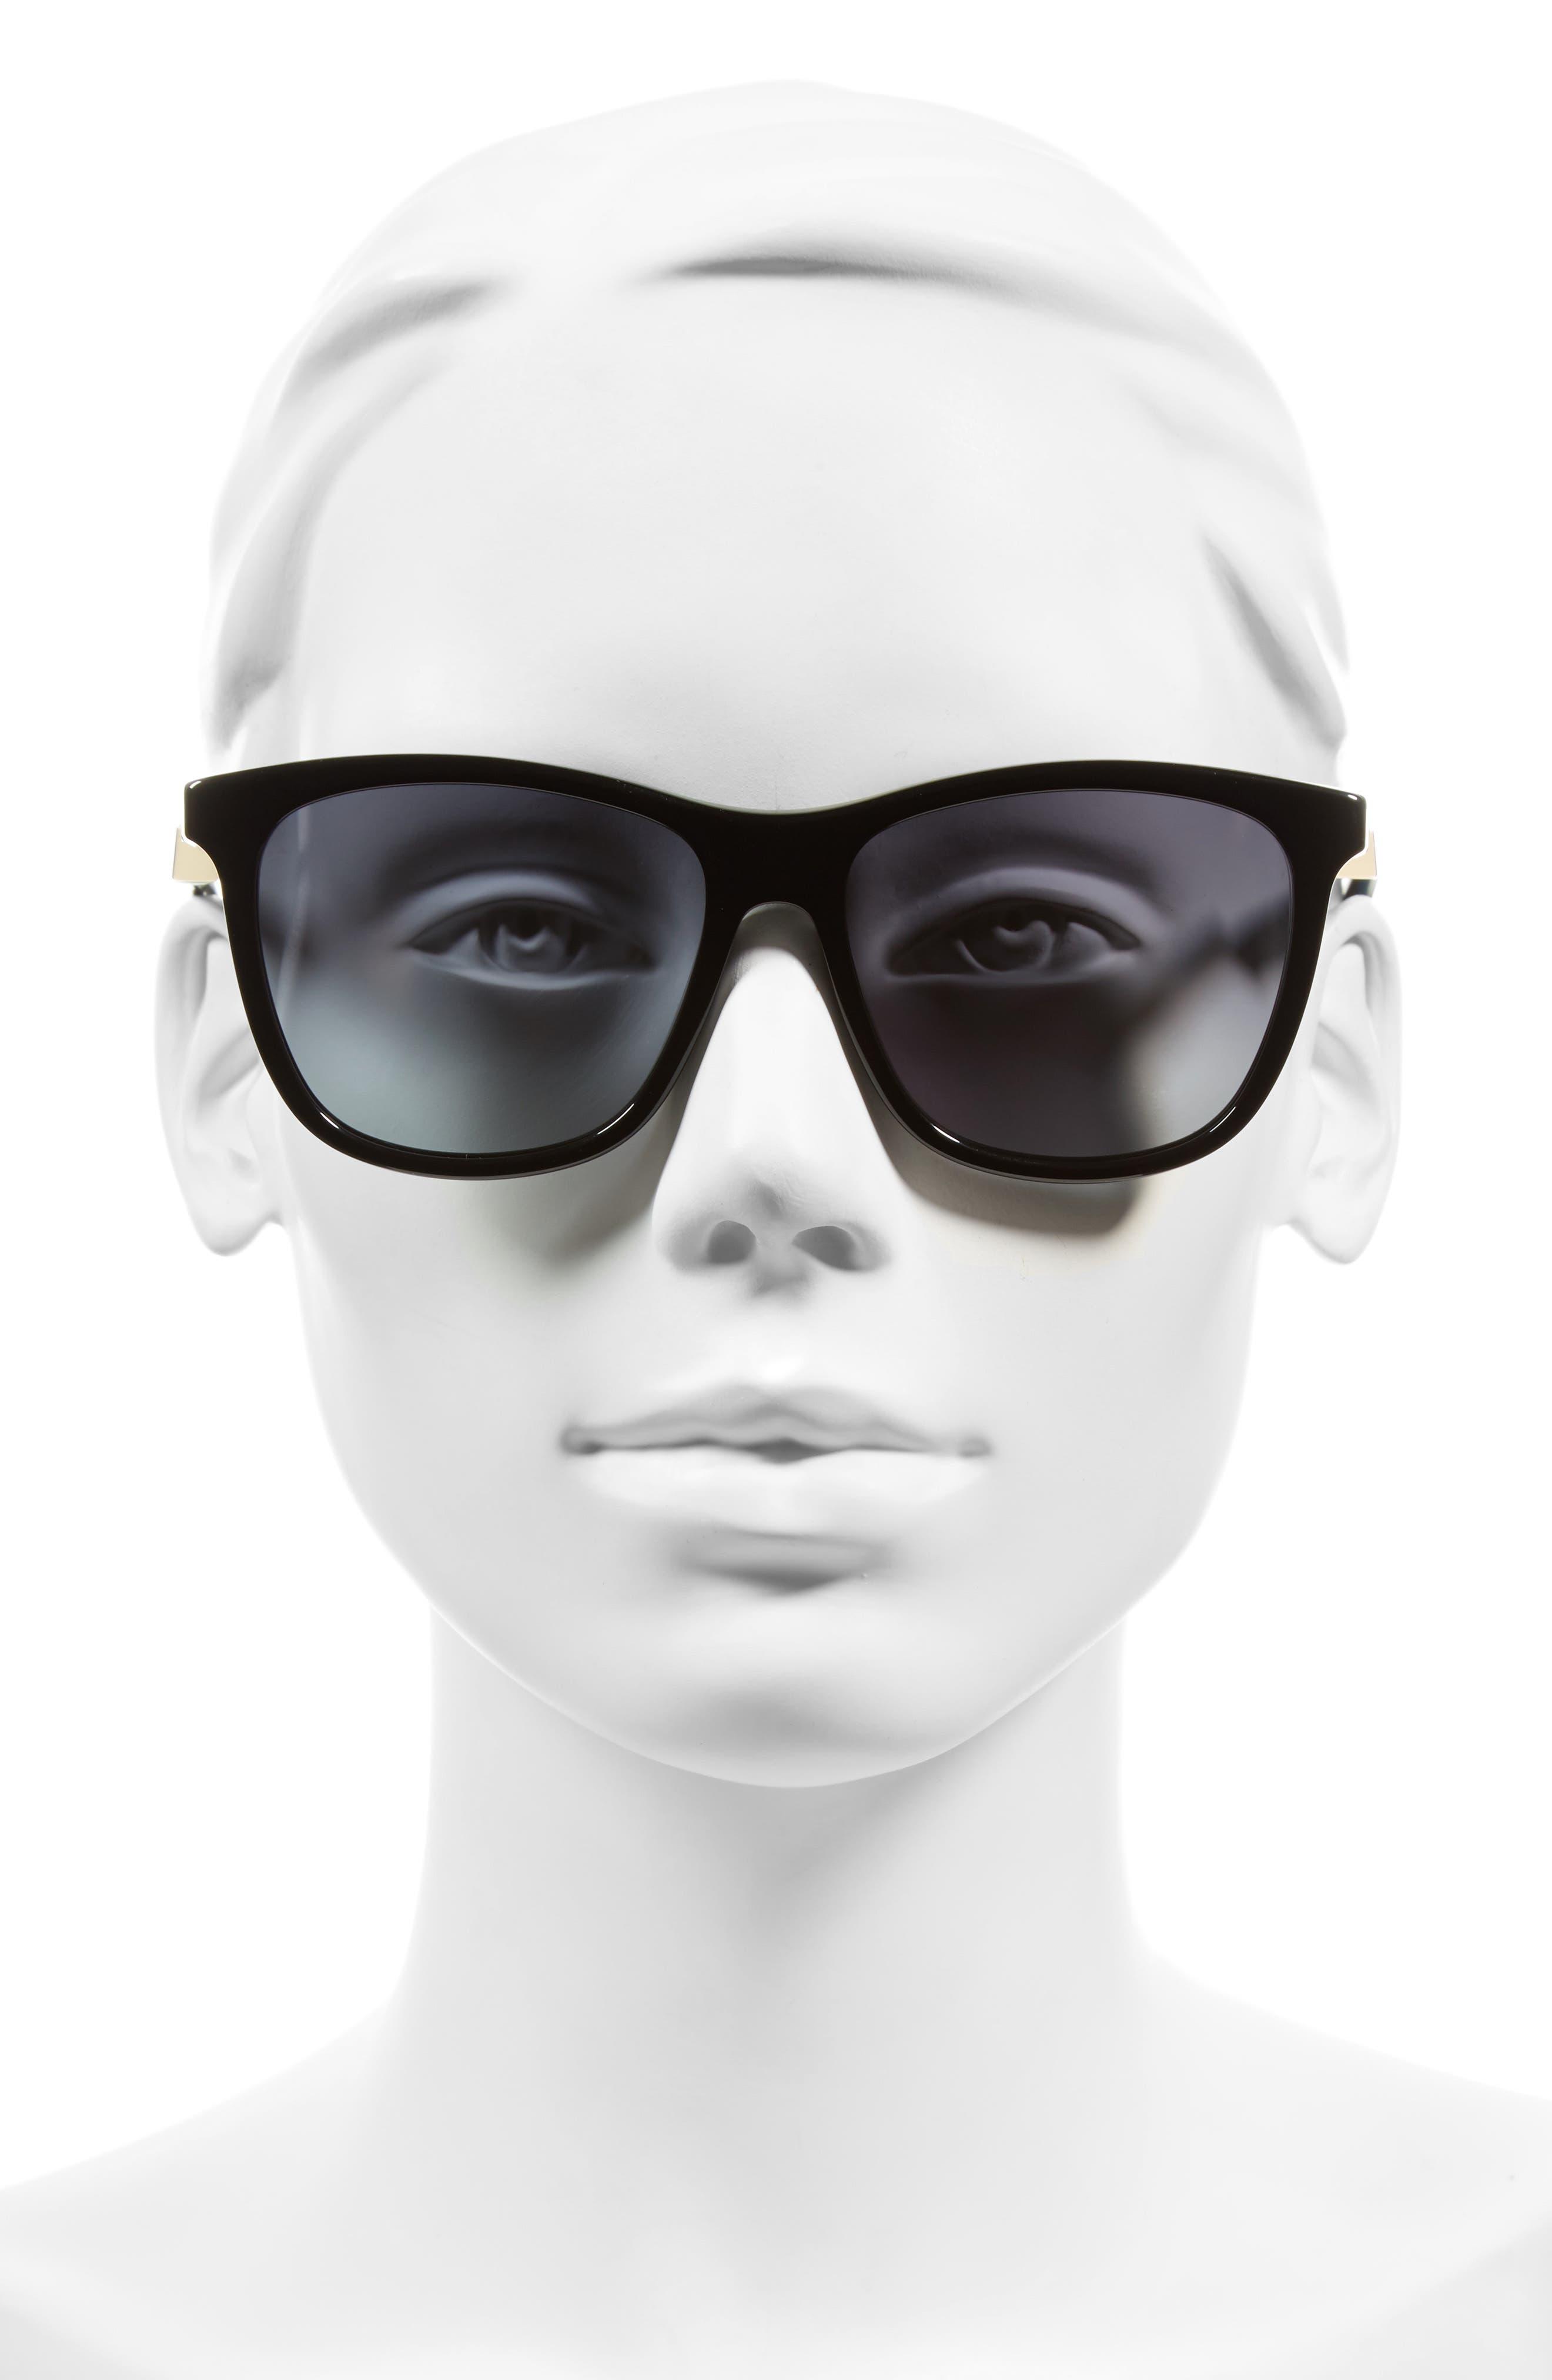 55mm Cube Retro Sunglasses,                             Alternate thumbnail 5, color,